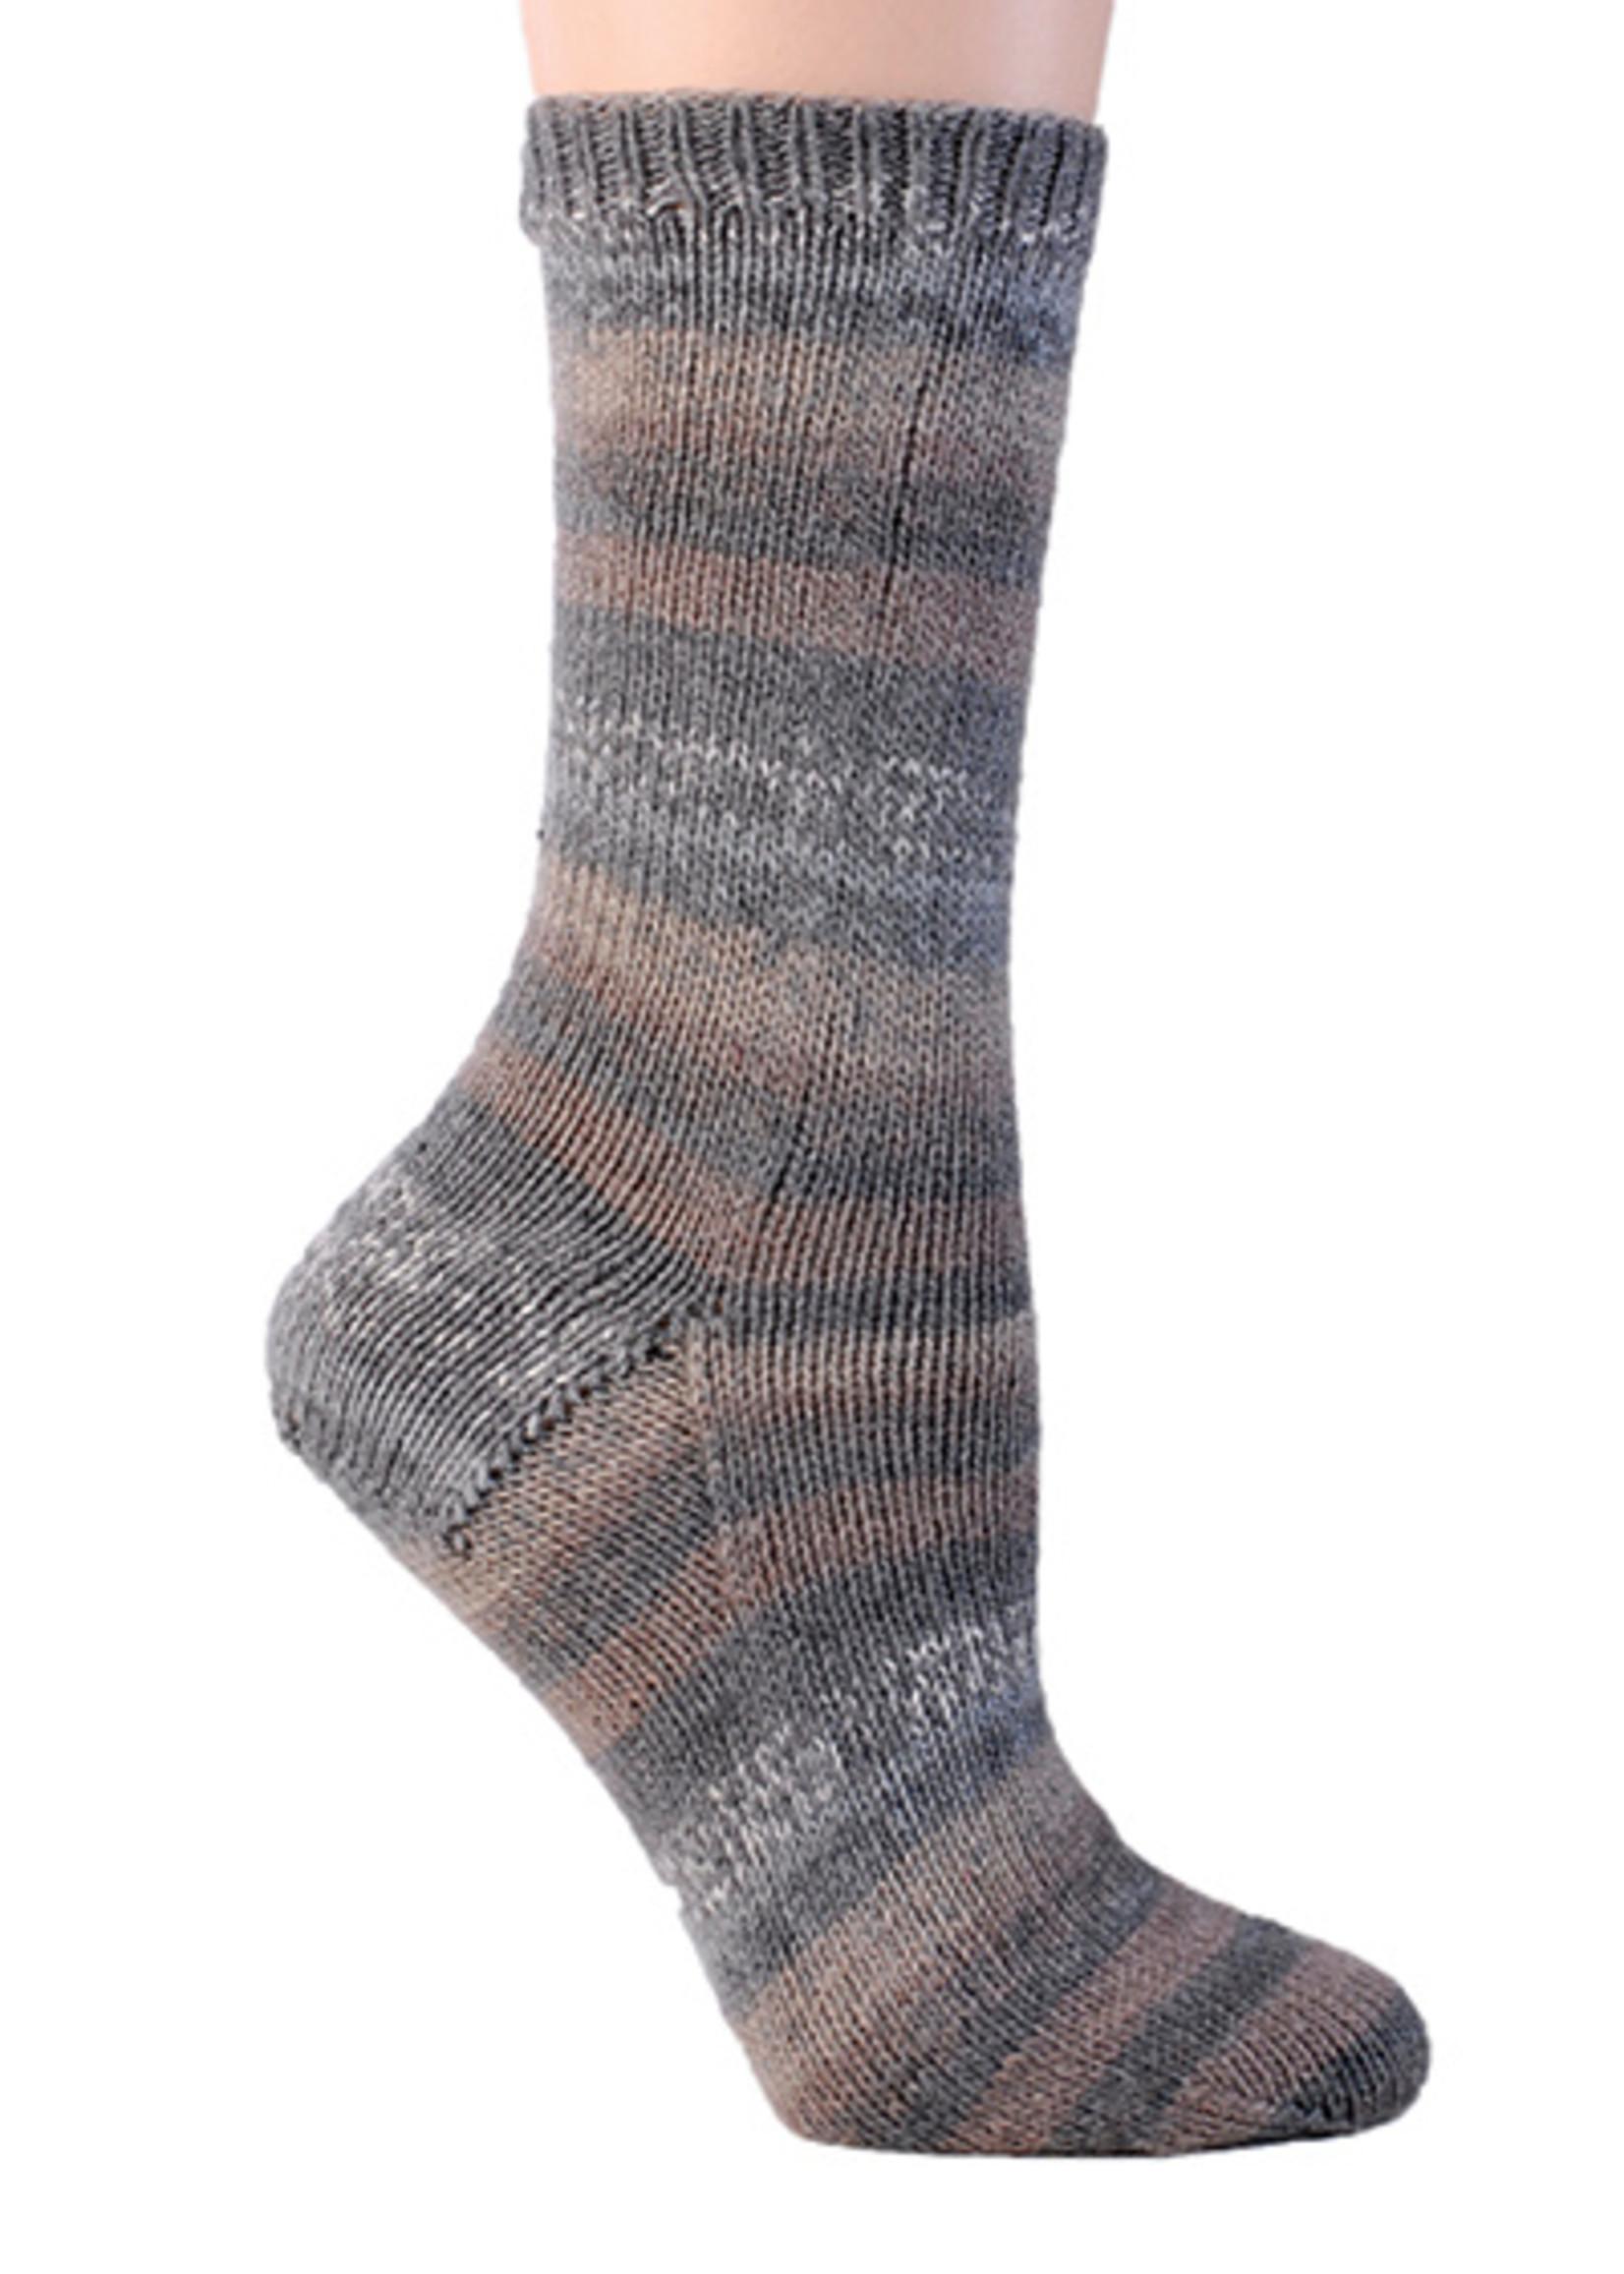 Berroco Berroco Comfort Sock Yarn #1814 Dunedin